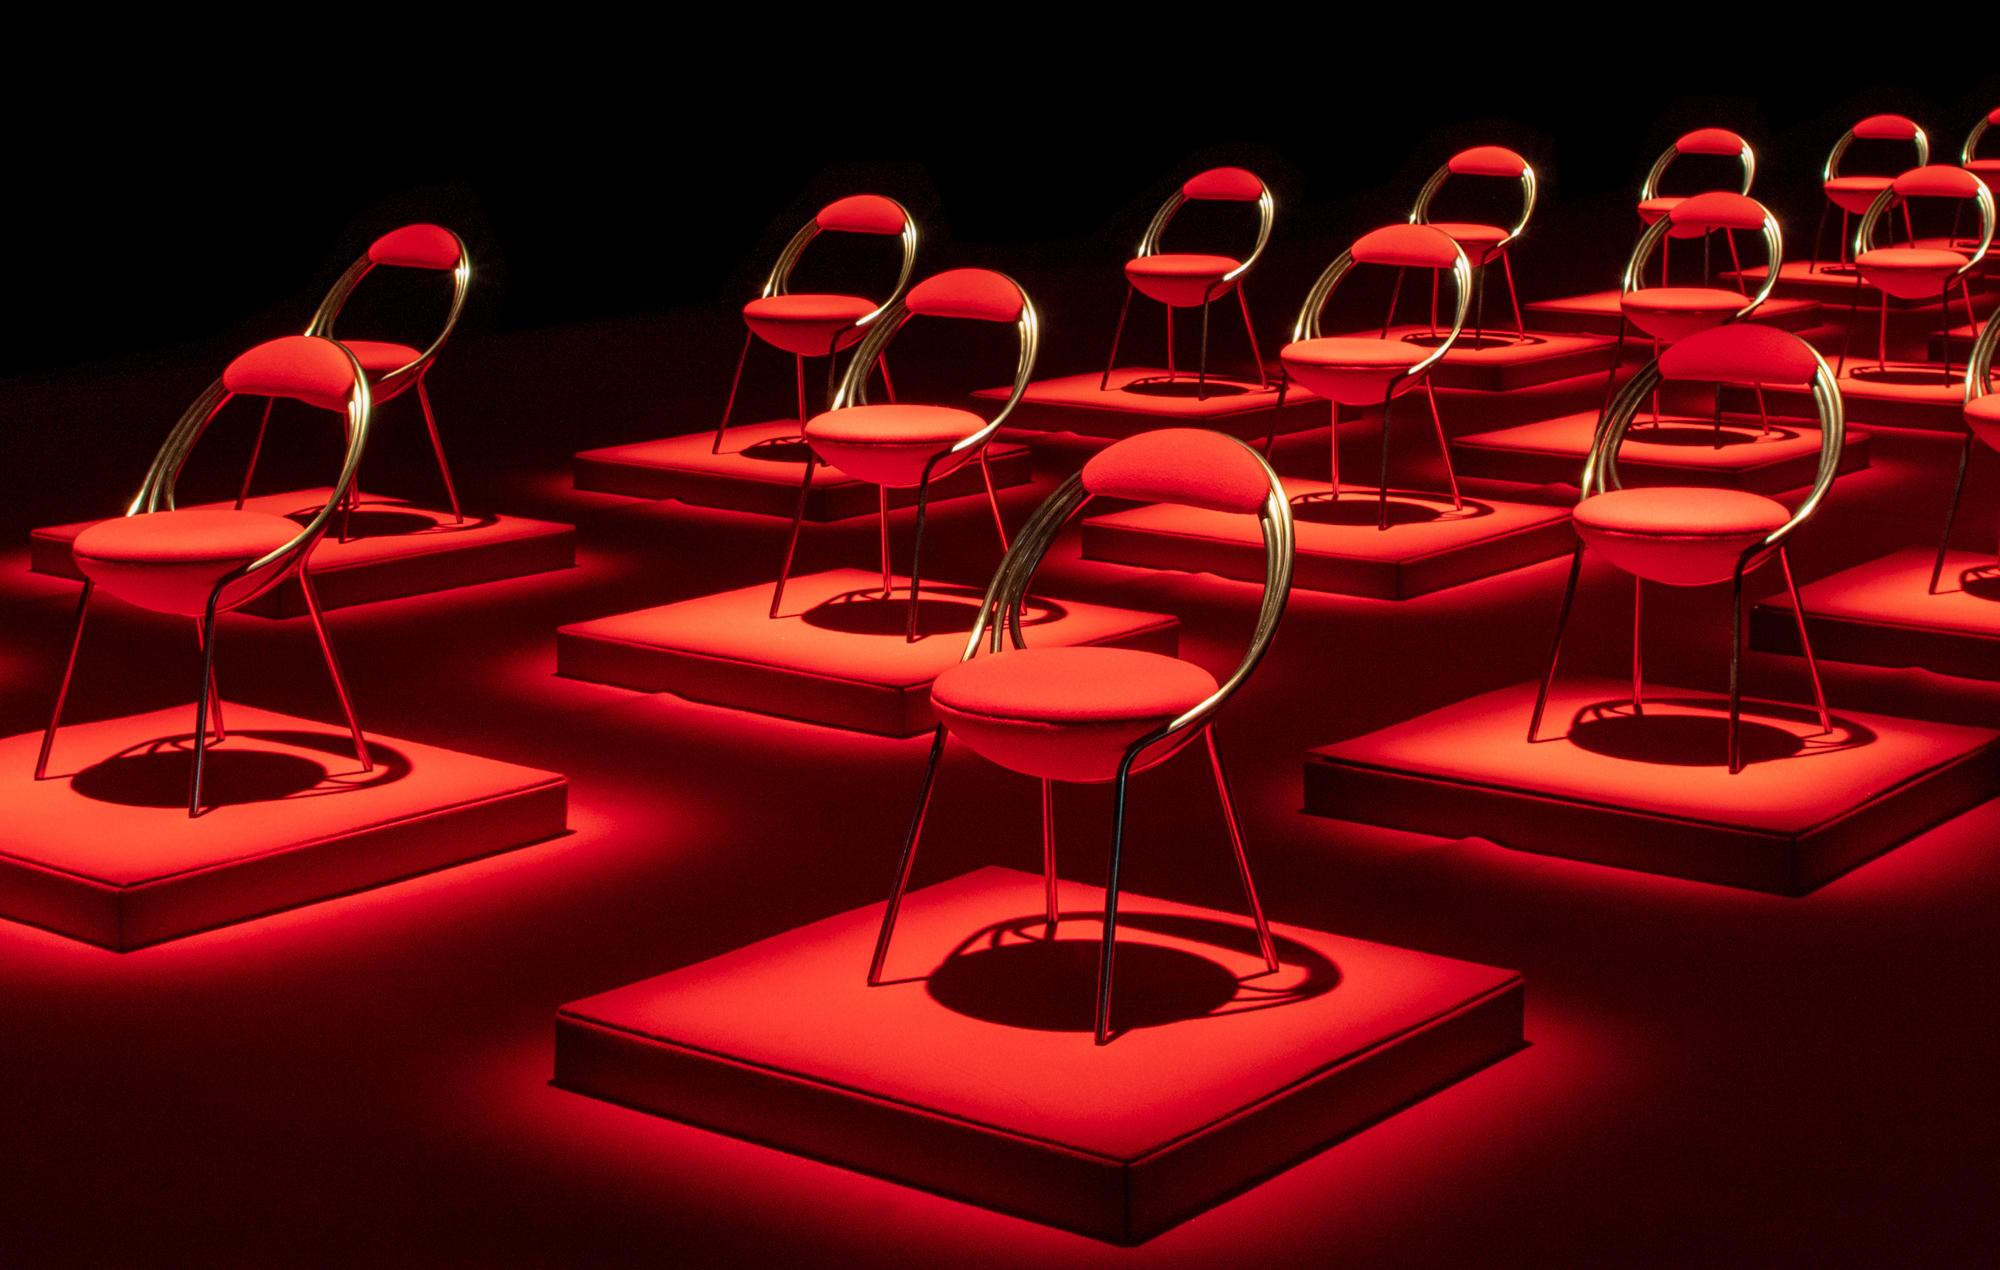 Maestro Chair von Lee Broom. Videostill: Lee Broom